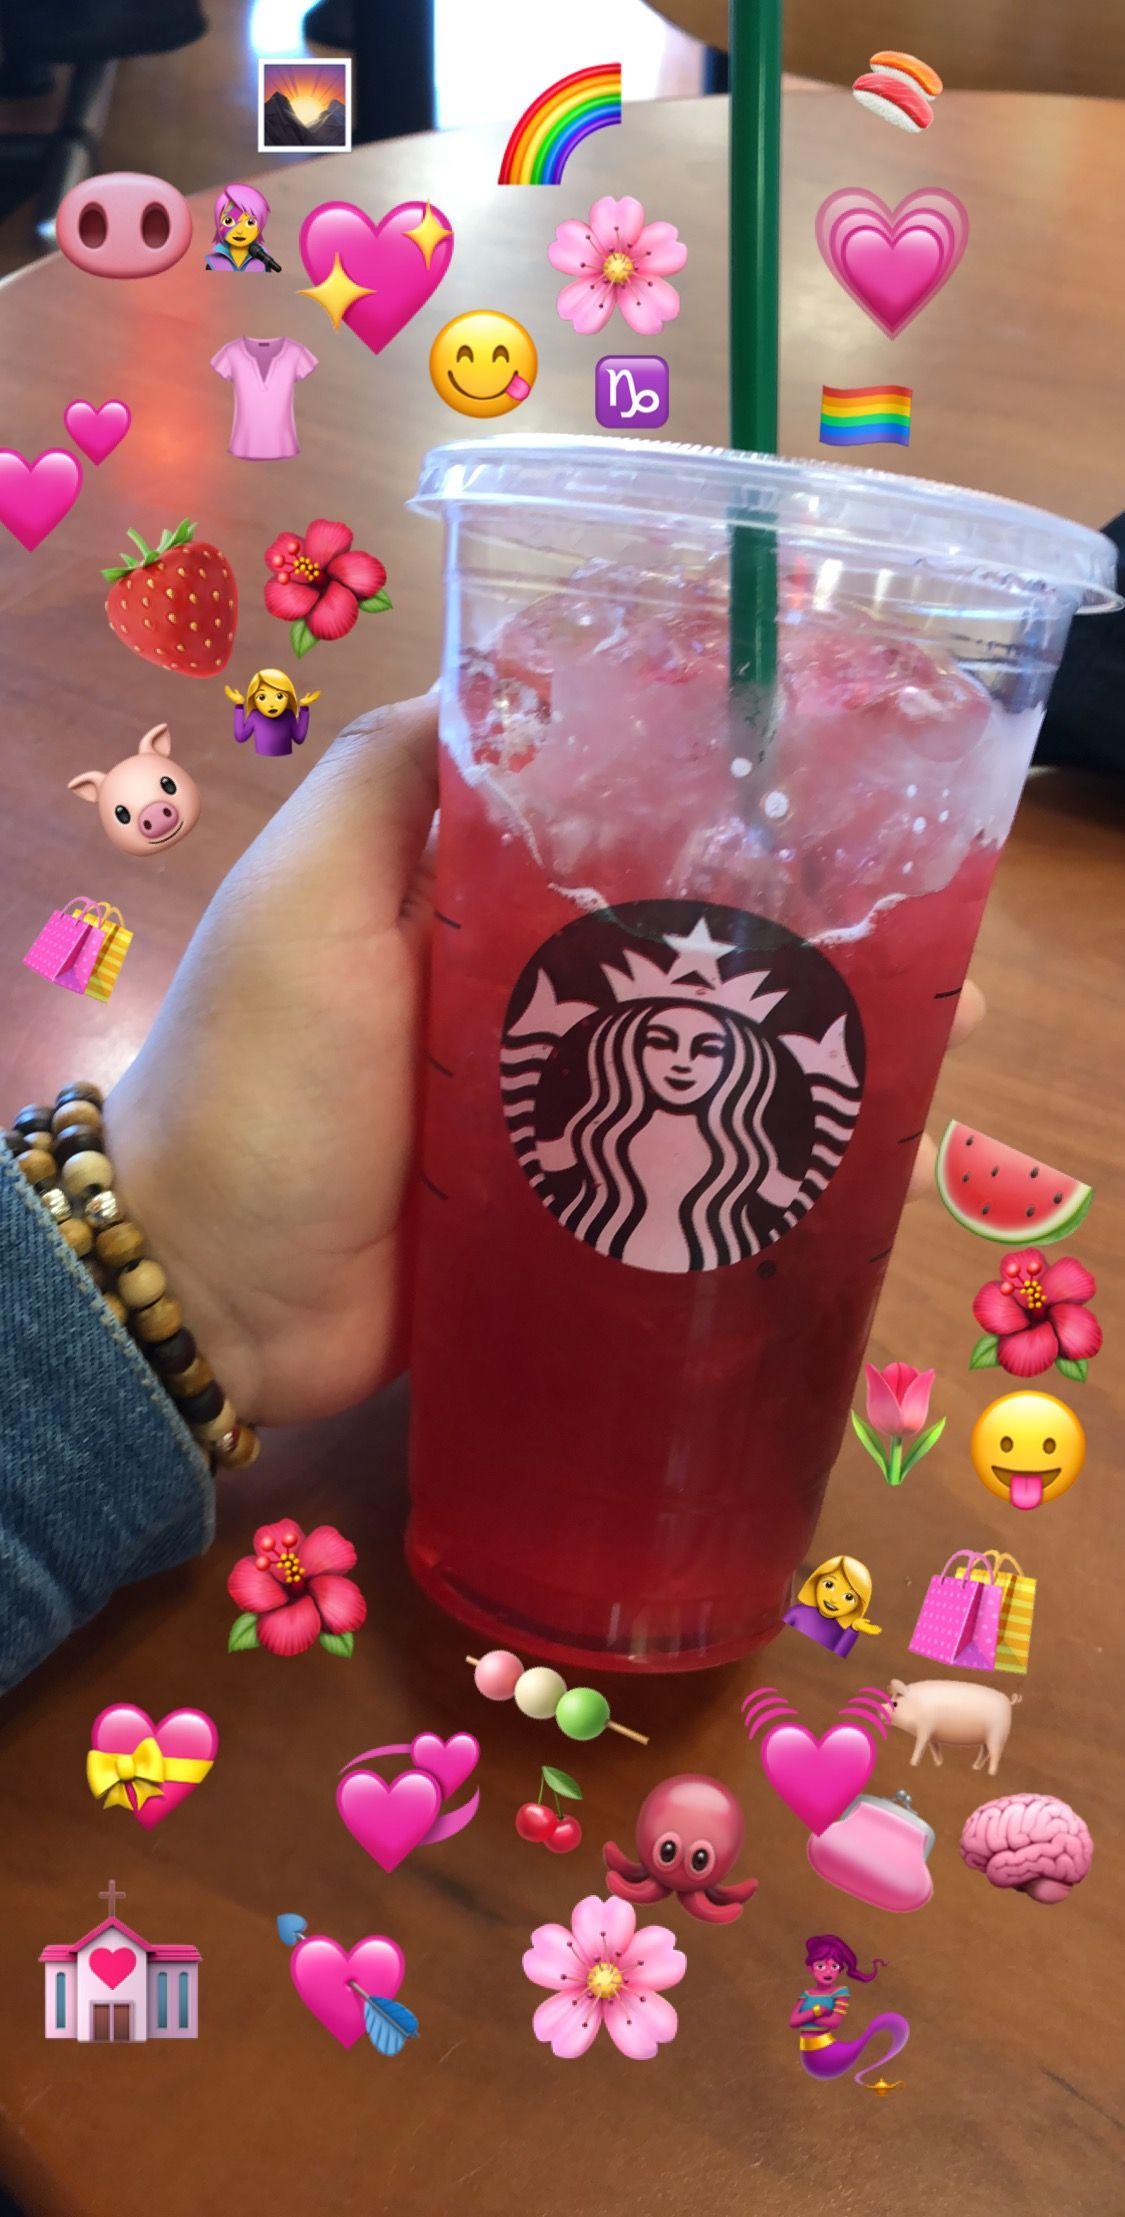 Aesthetic Tumblr Pink Starbucks Emojis Cute Ideias De